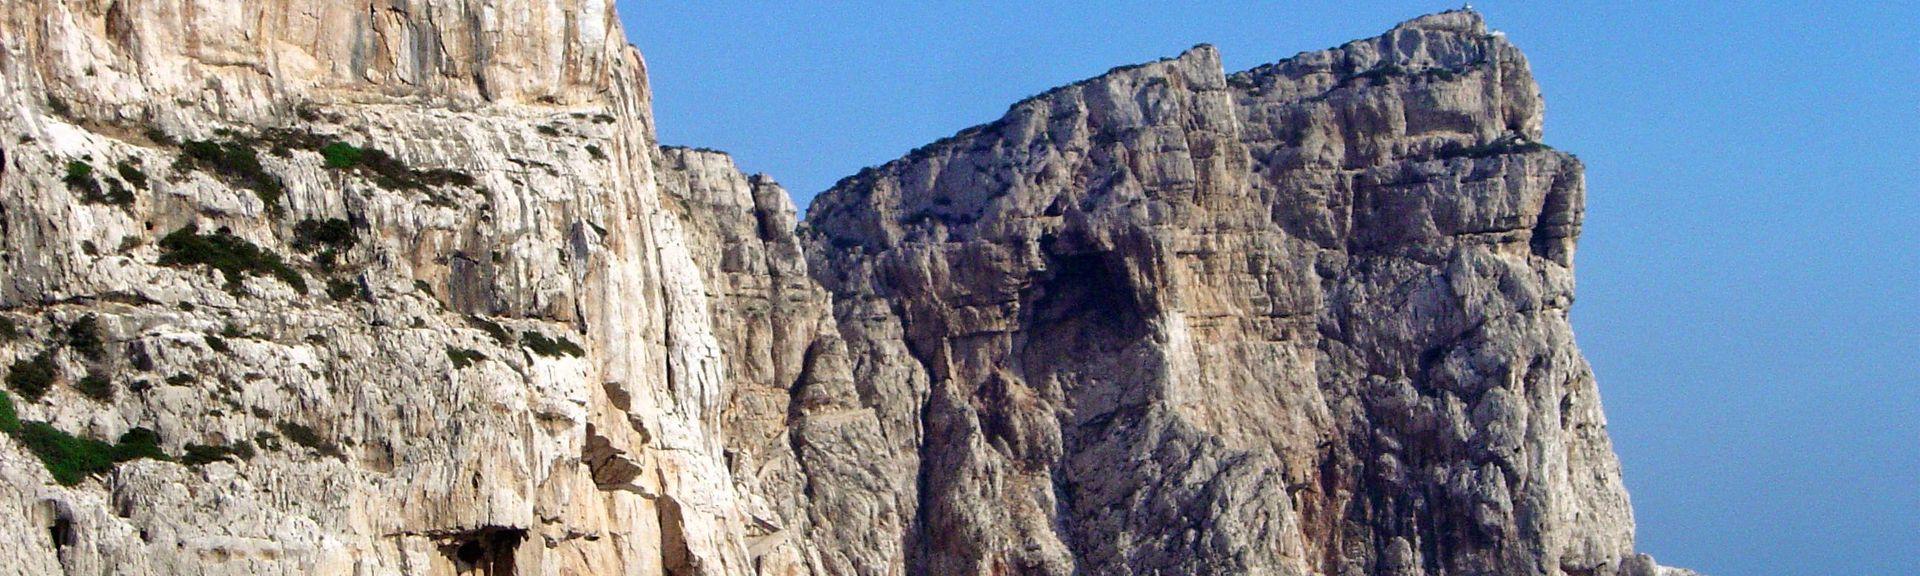 Alghero, Sardinia, Italia